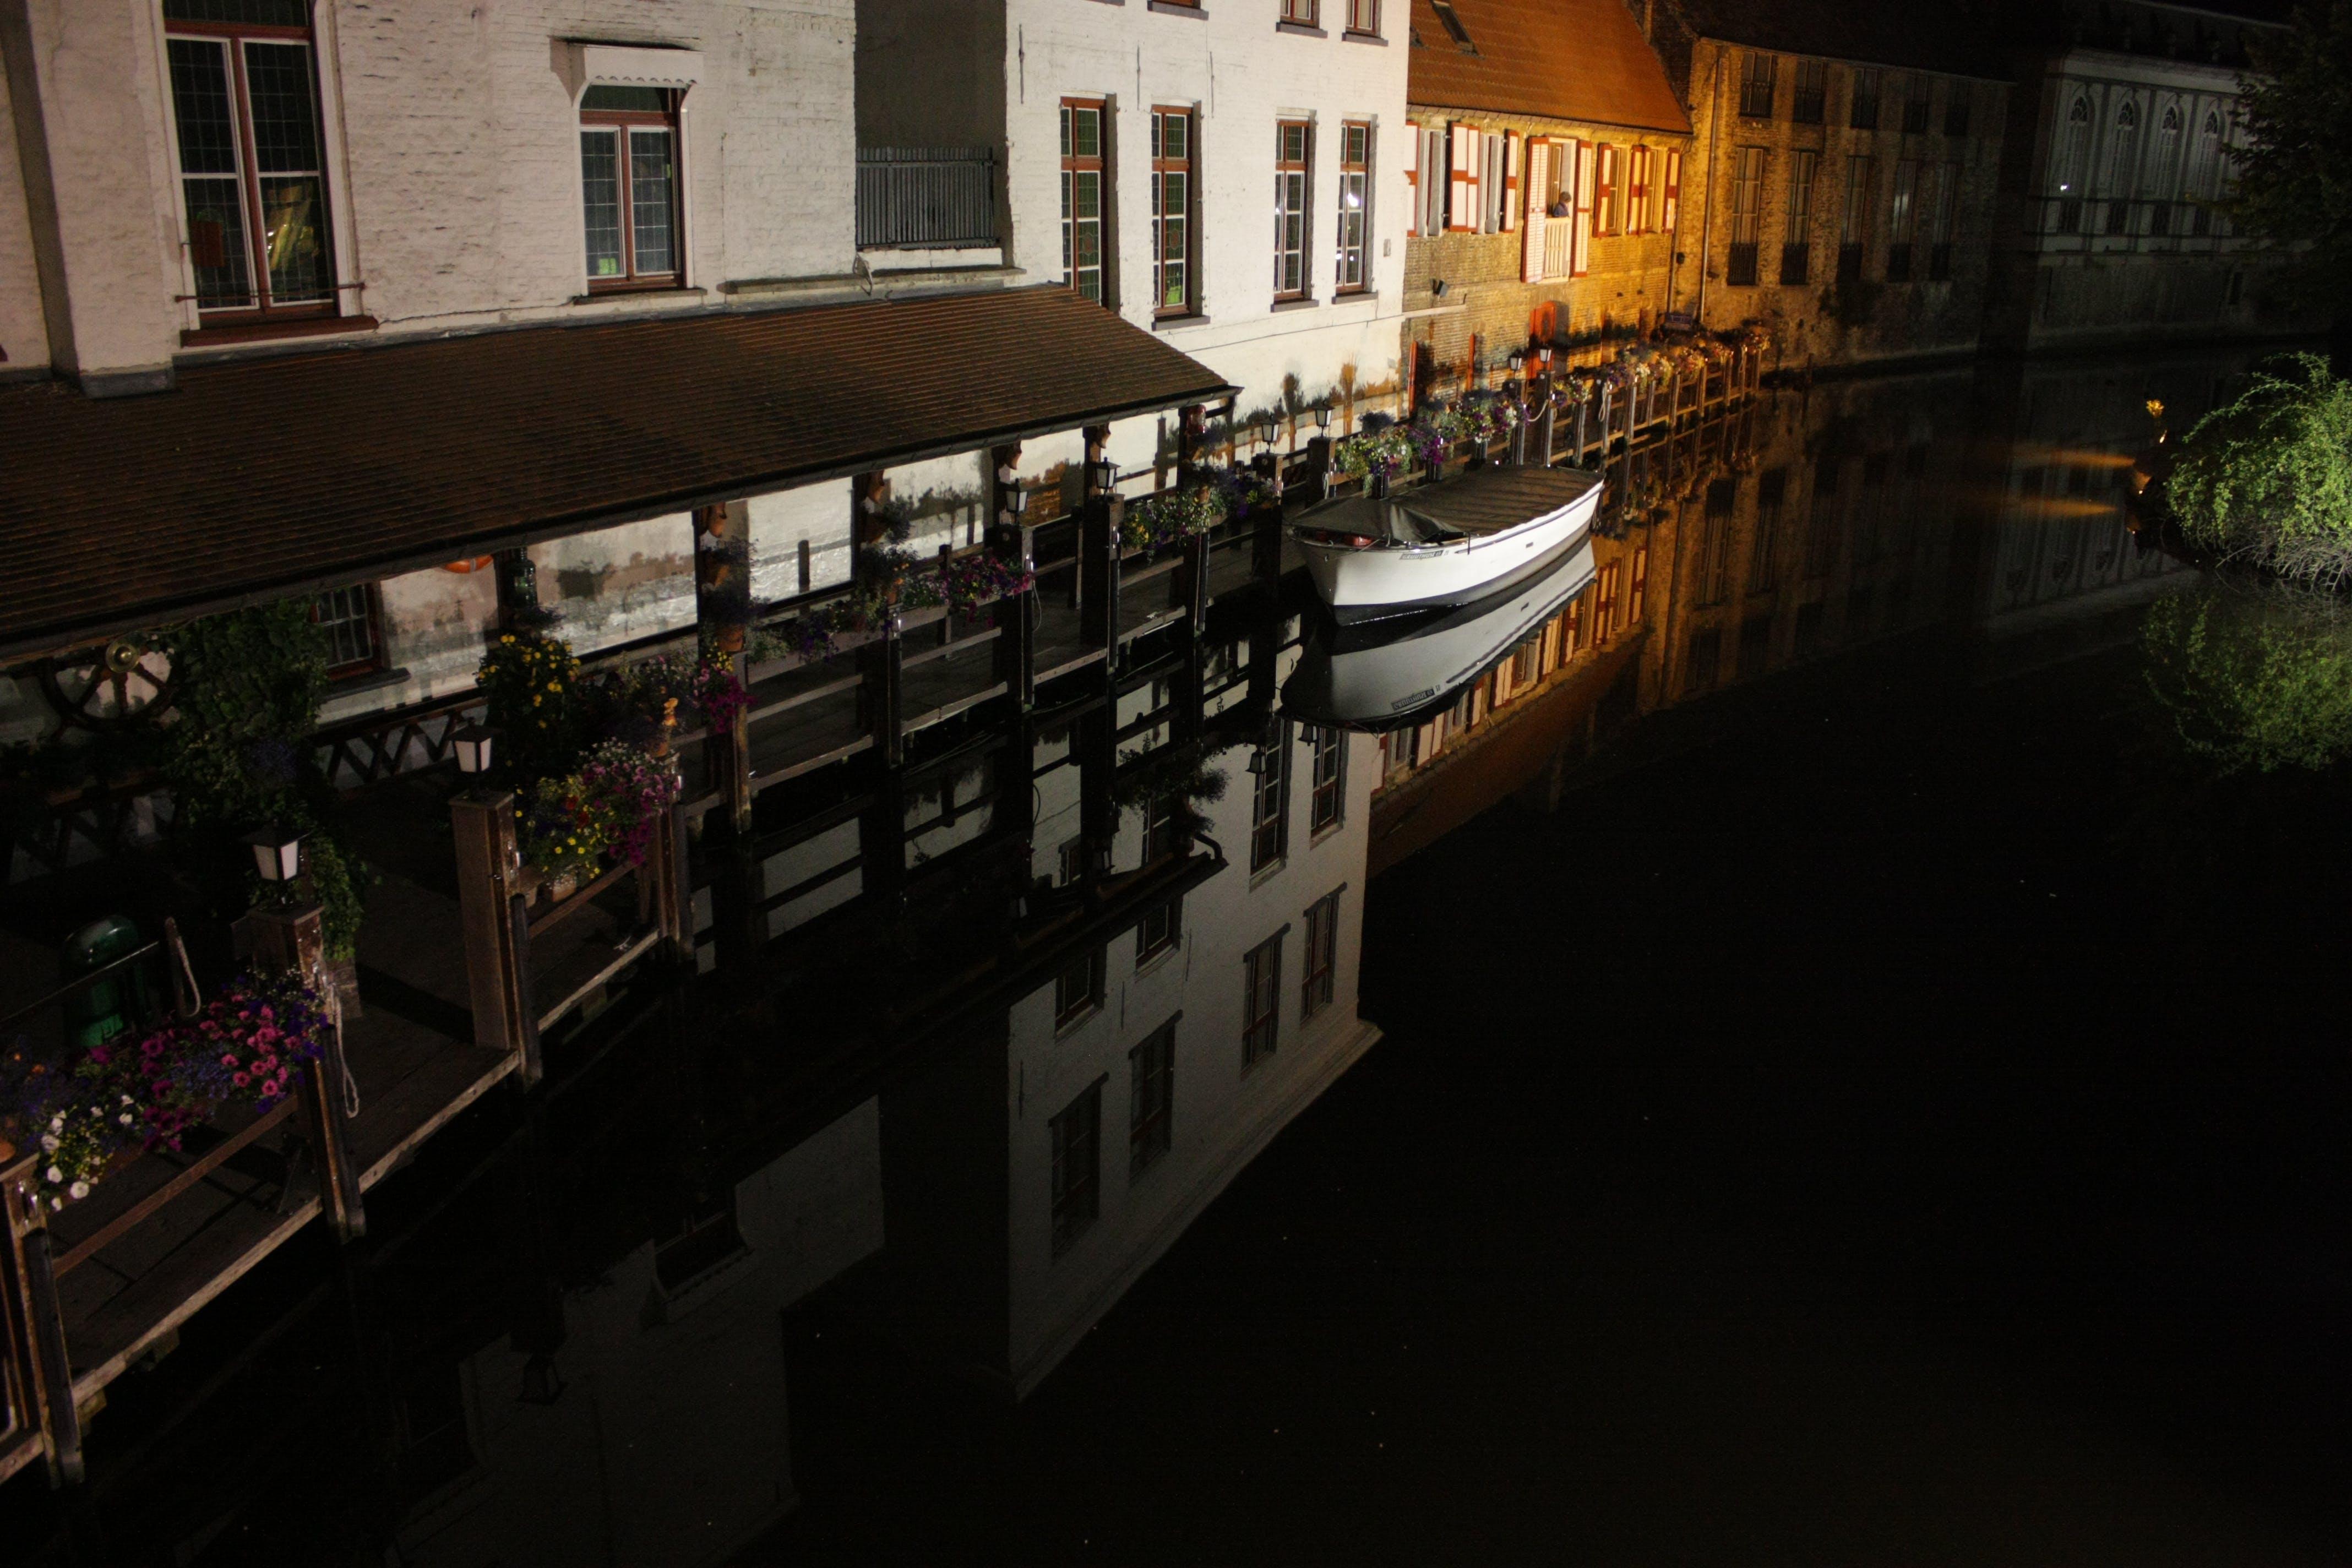 Fotos de stock gratuitas de agua, barca, Bélgica, brujas